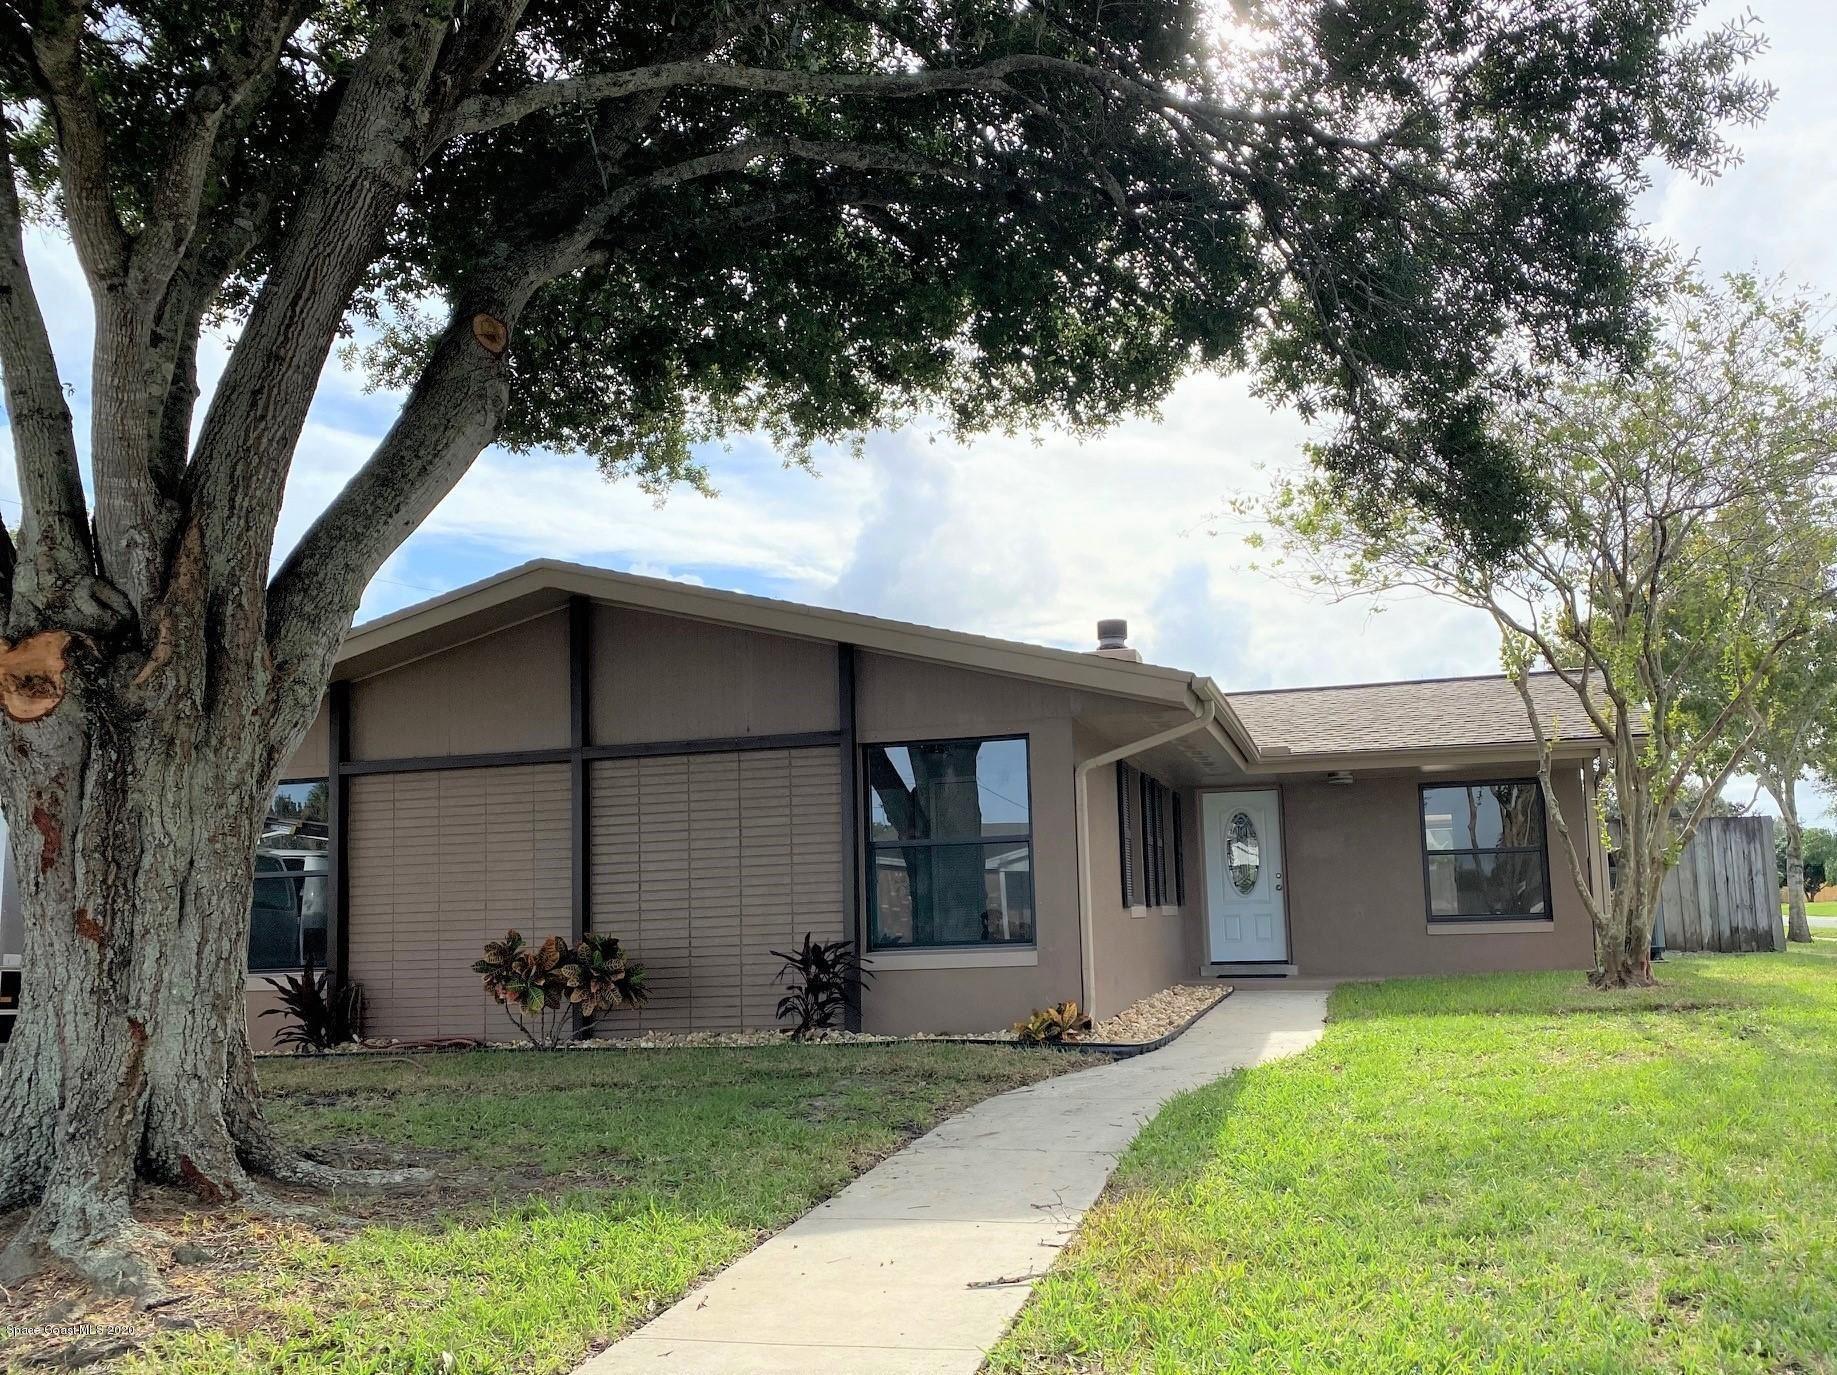 953 Brewster Lane, Rockledge, FL 32955 - #: 888745